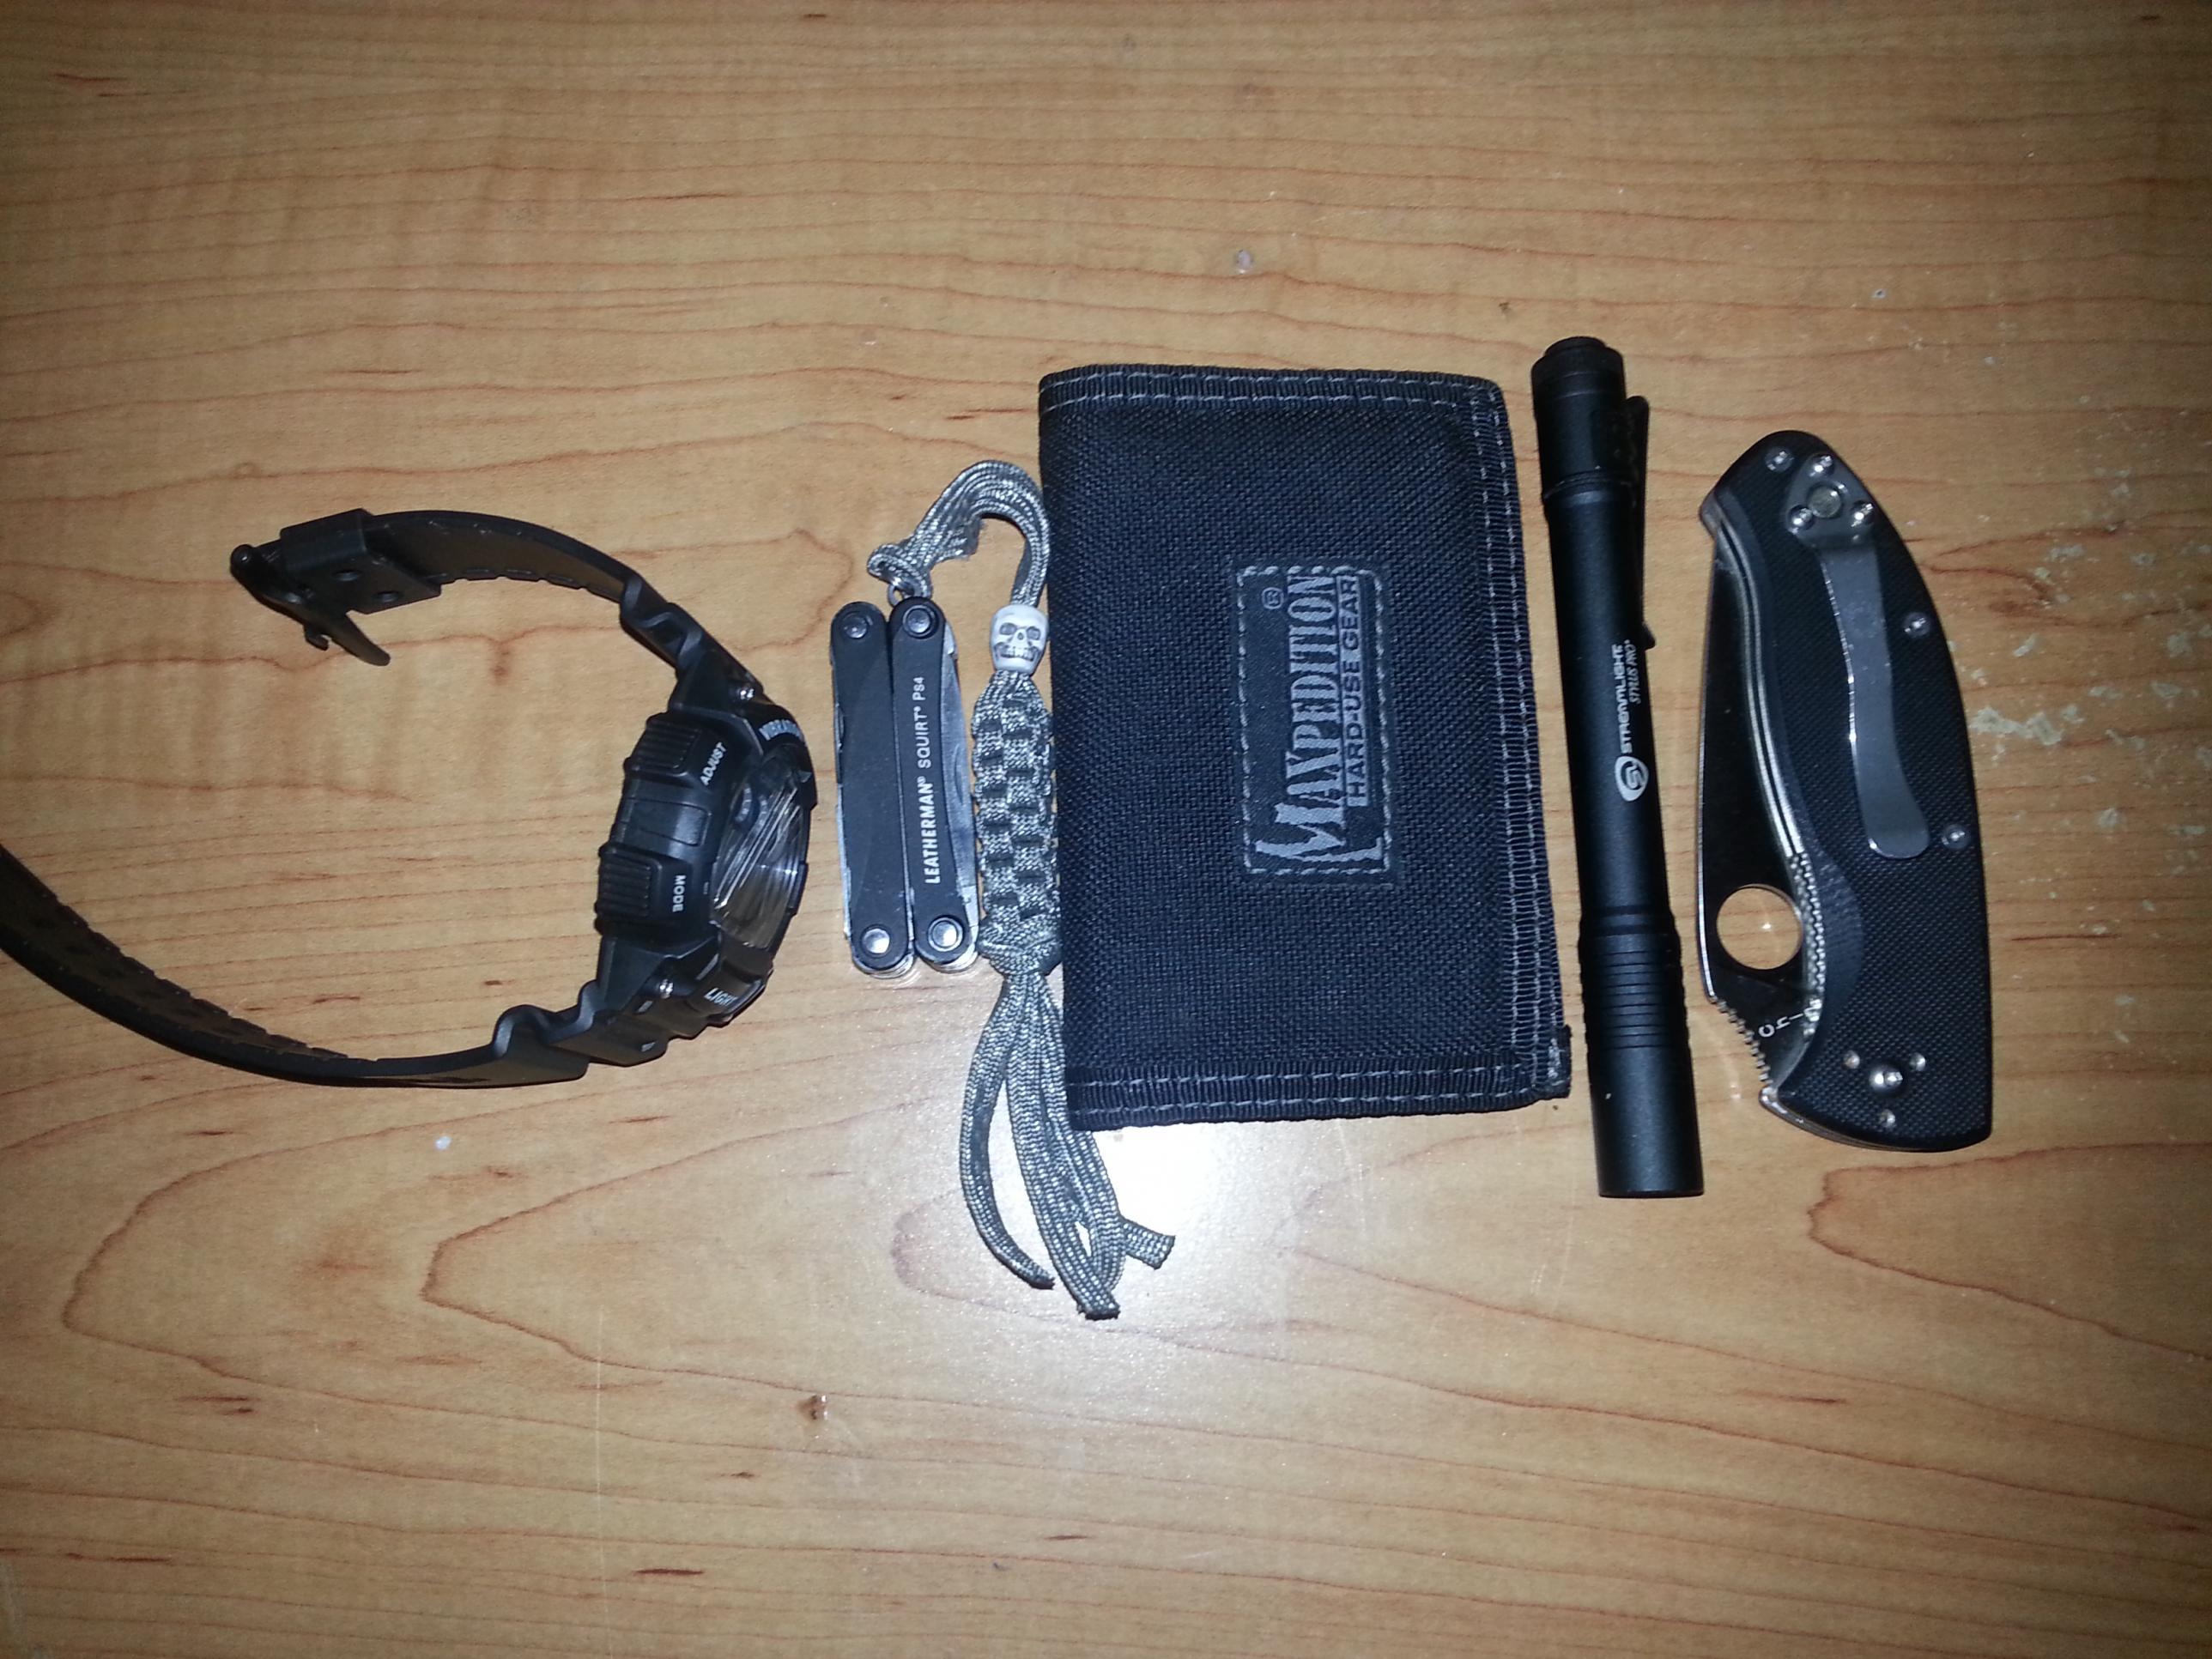 New Knives - Spyderco Tenacious & Benchmade Mini Ascender-023.jpg